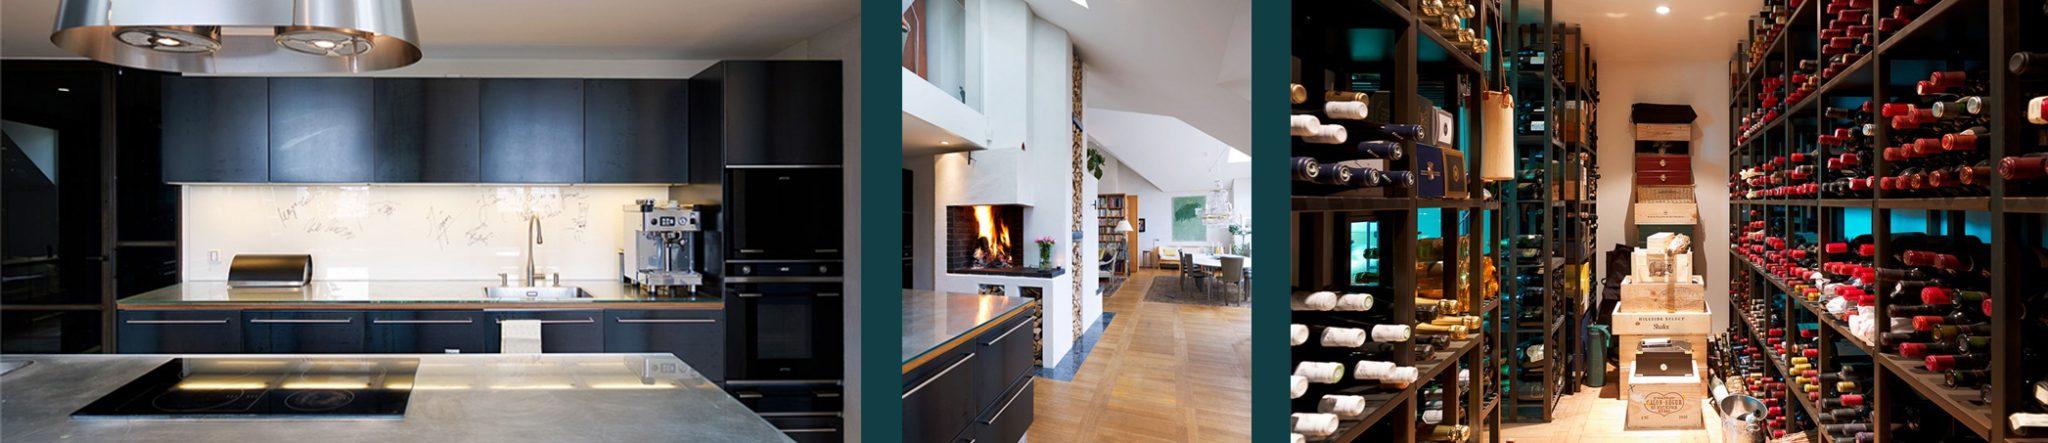 Vindsvåning i Stockholm av Rex Arkitektbyrå. Vardagsrum med kakelugn samt kök.